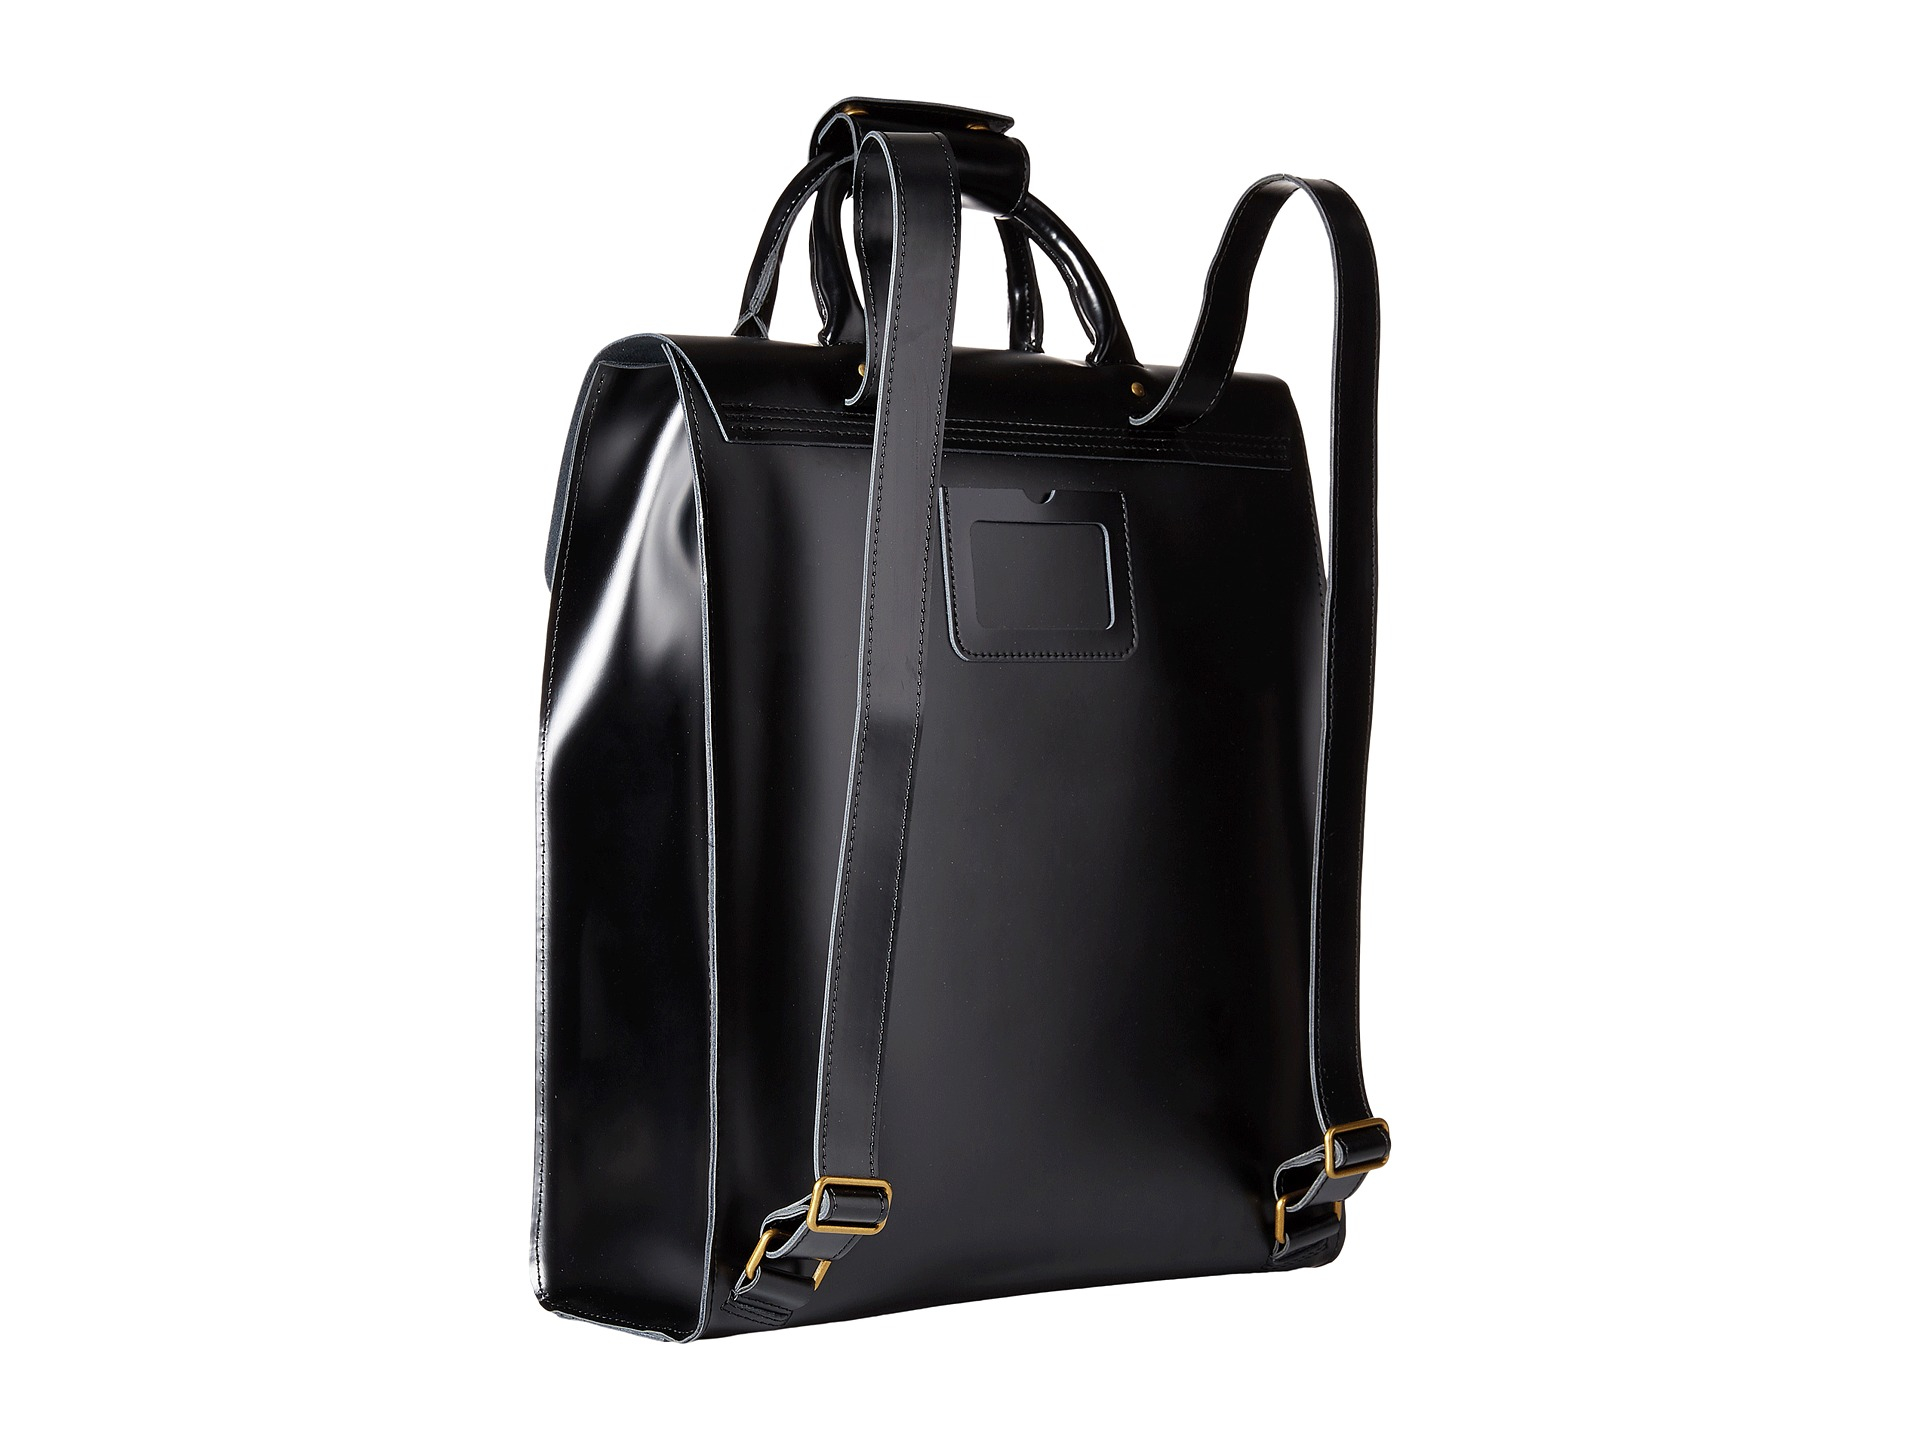 41edab7fbc Dr Martens Small Black Leather Backpack- Fenix Toulouse Handball